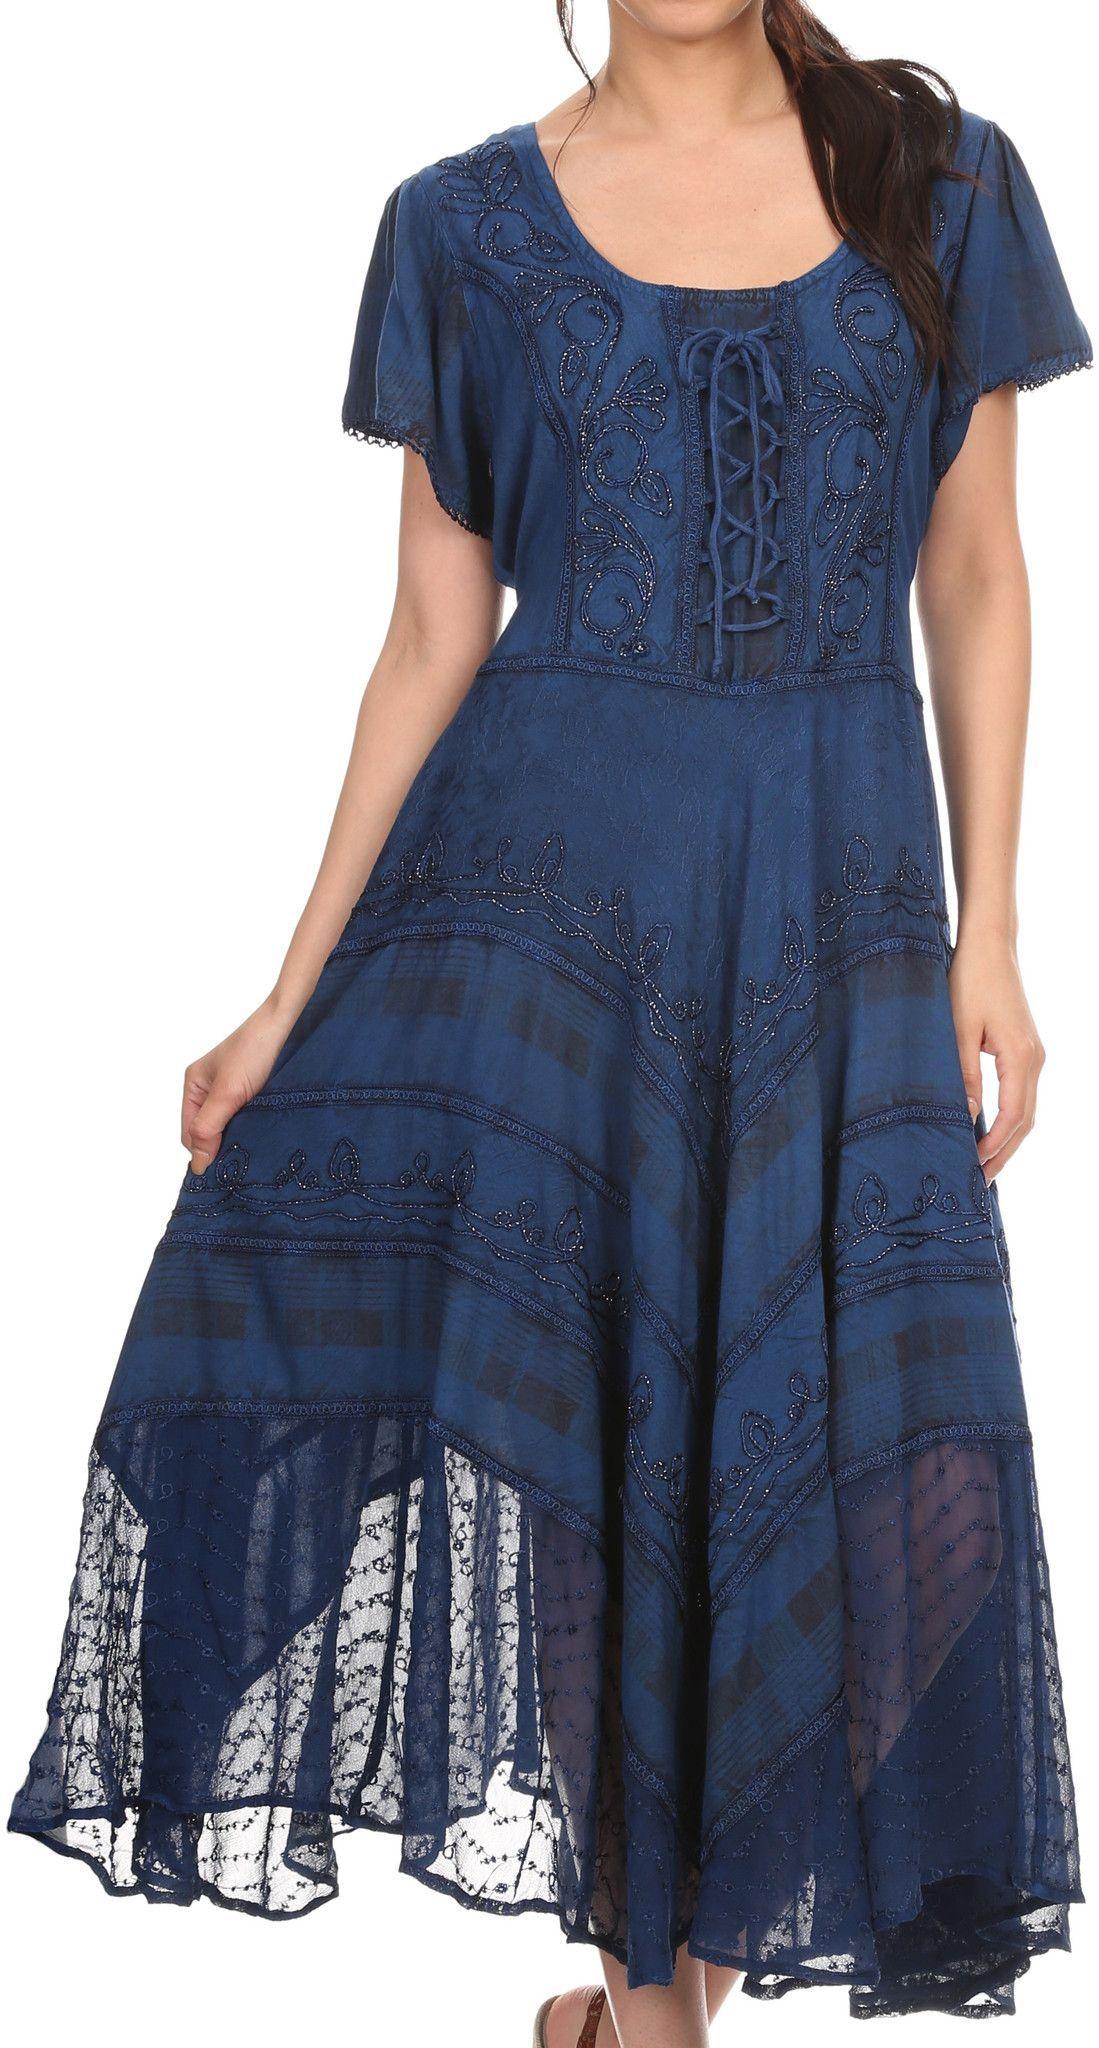 Sakkas mila long corset embroidered cap sleeve dress with adjustable